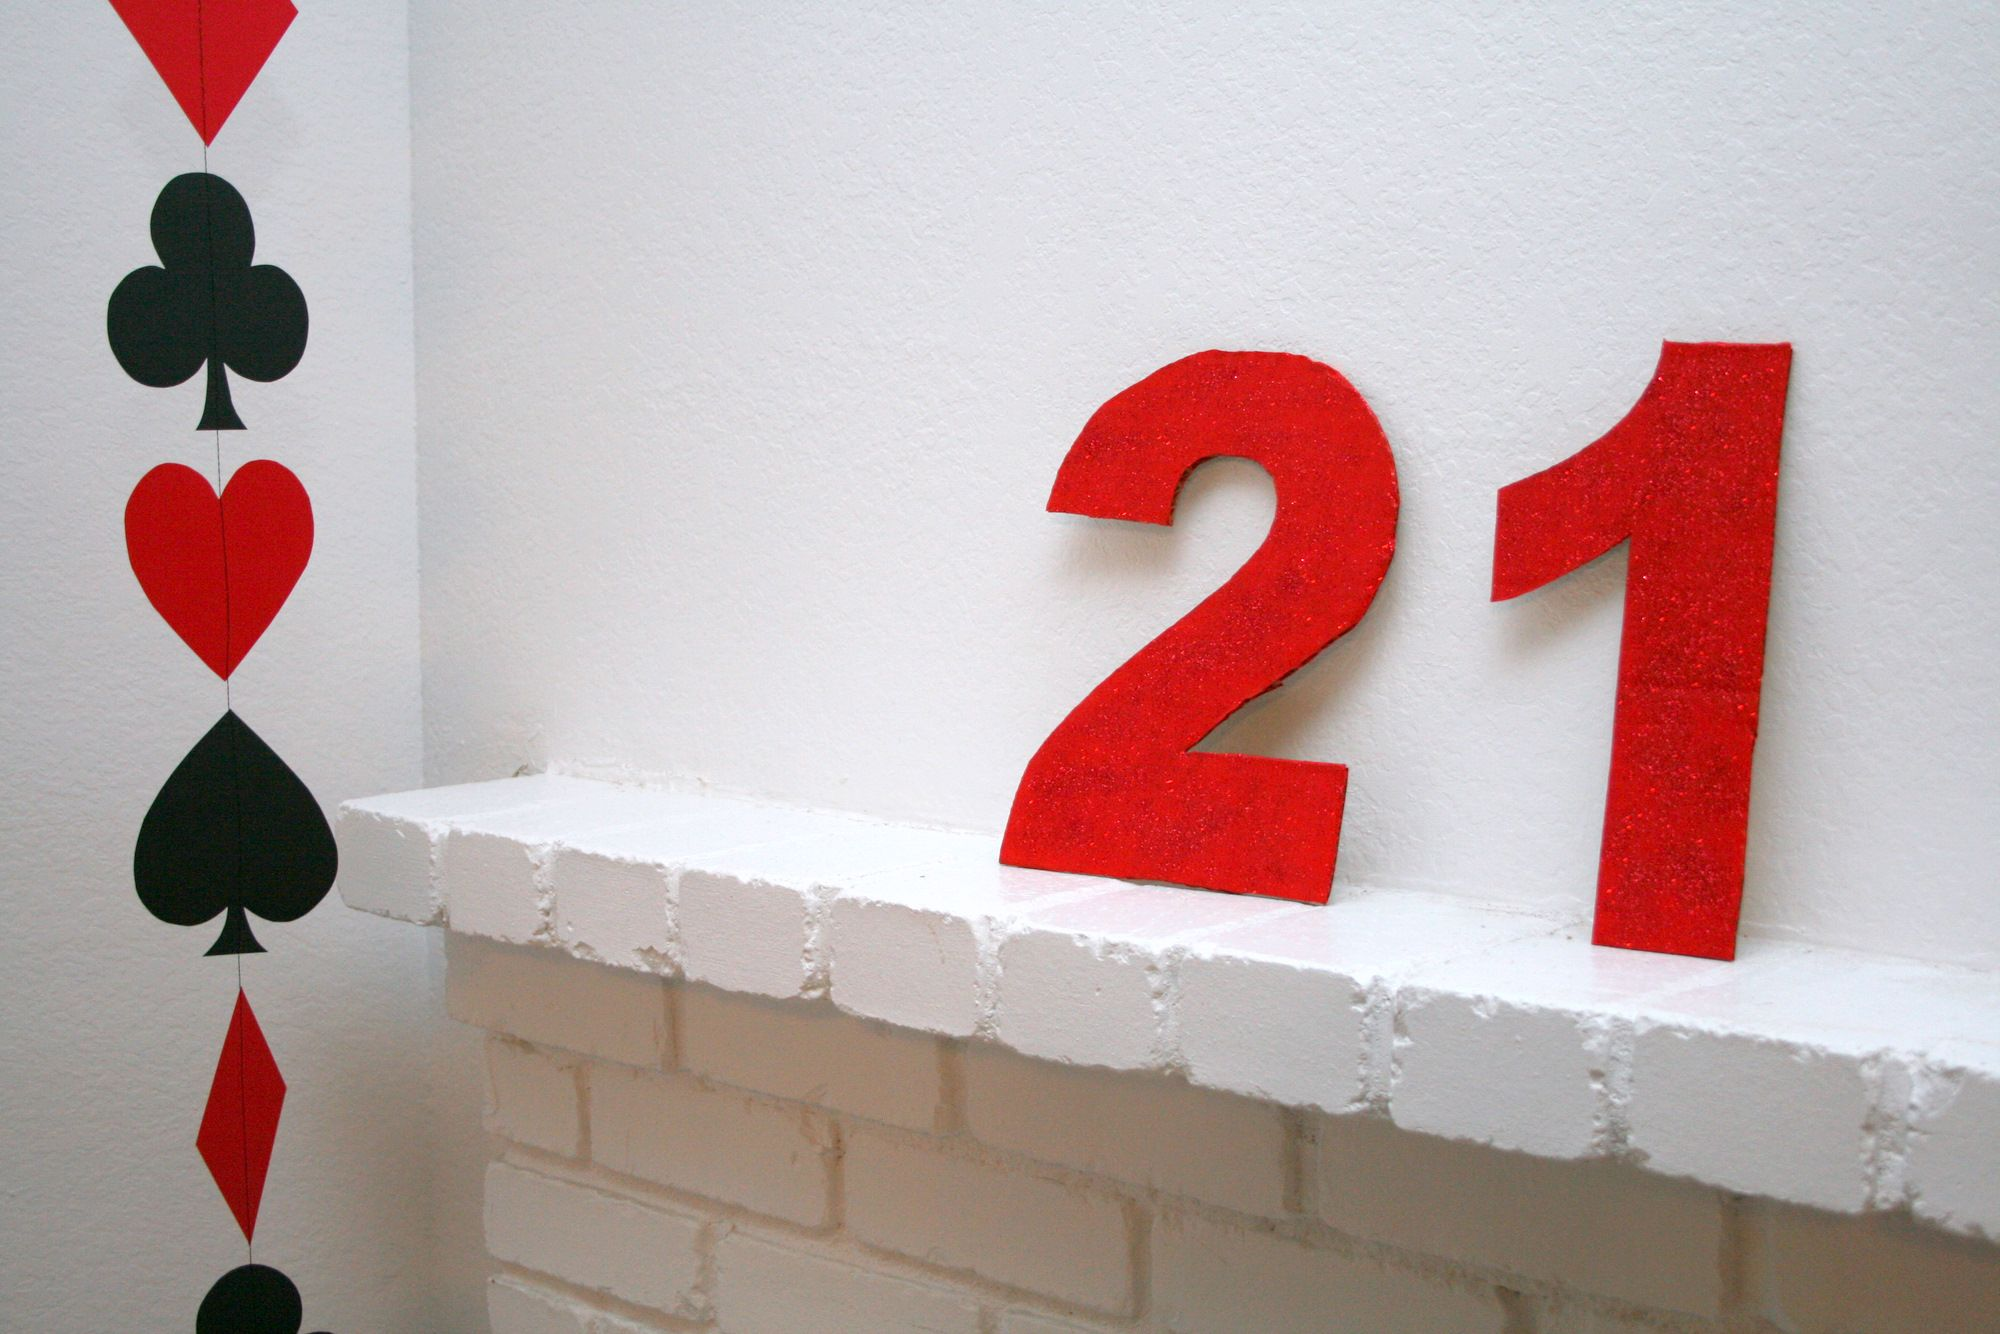 DIY Casino Night at Home for Twenty-First Birthday | Parties ...